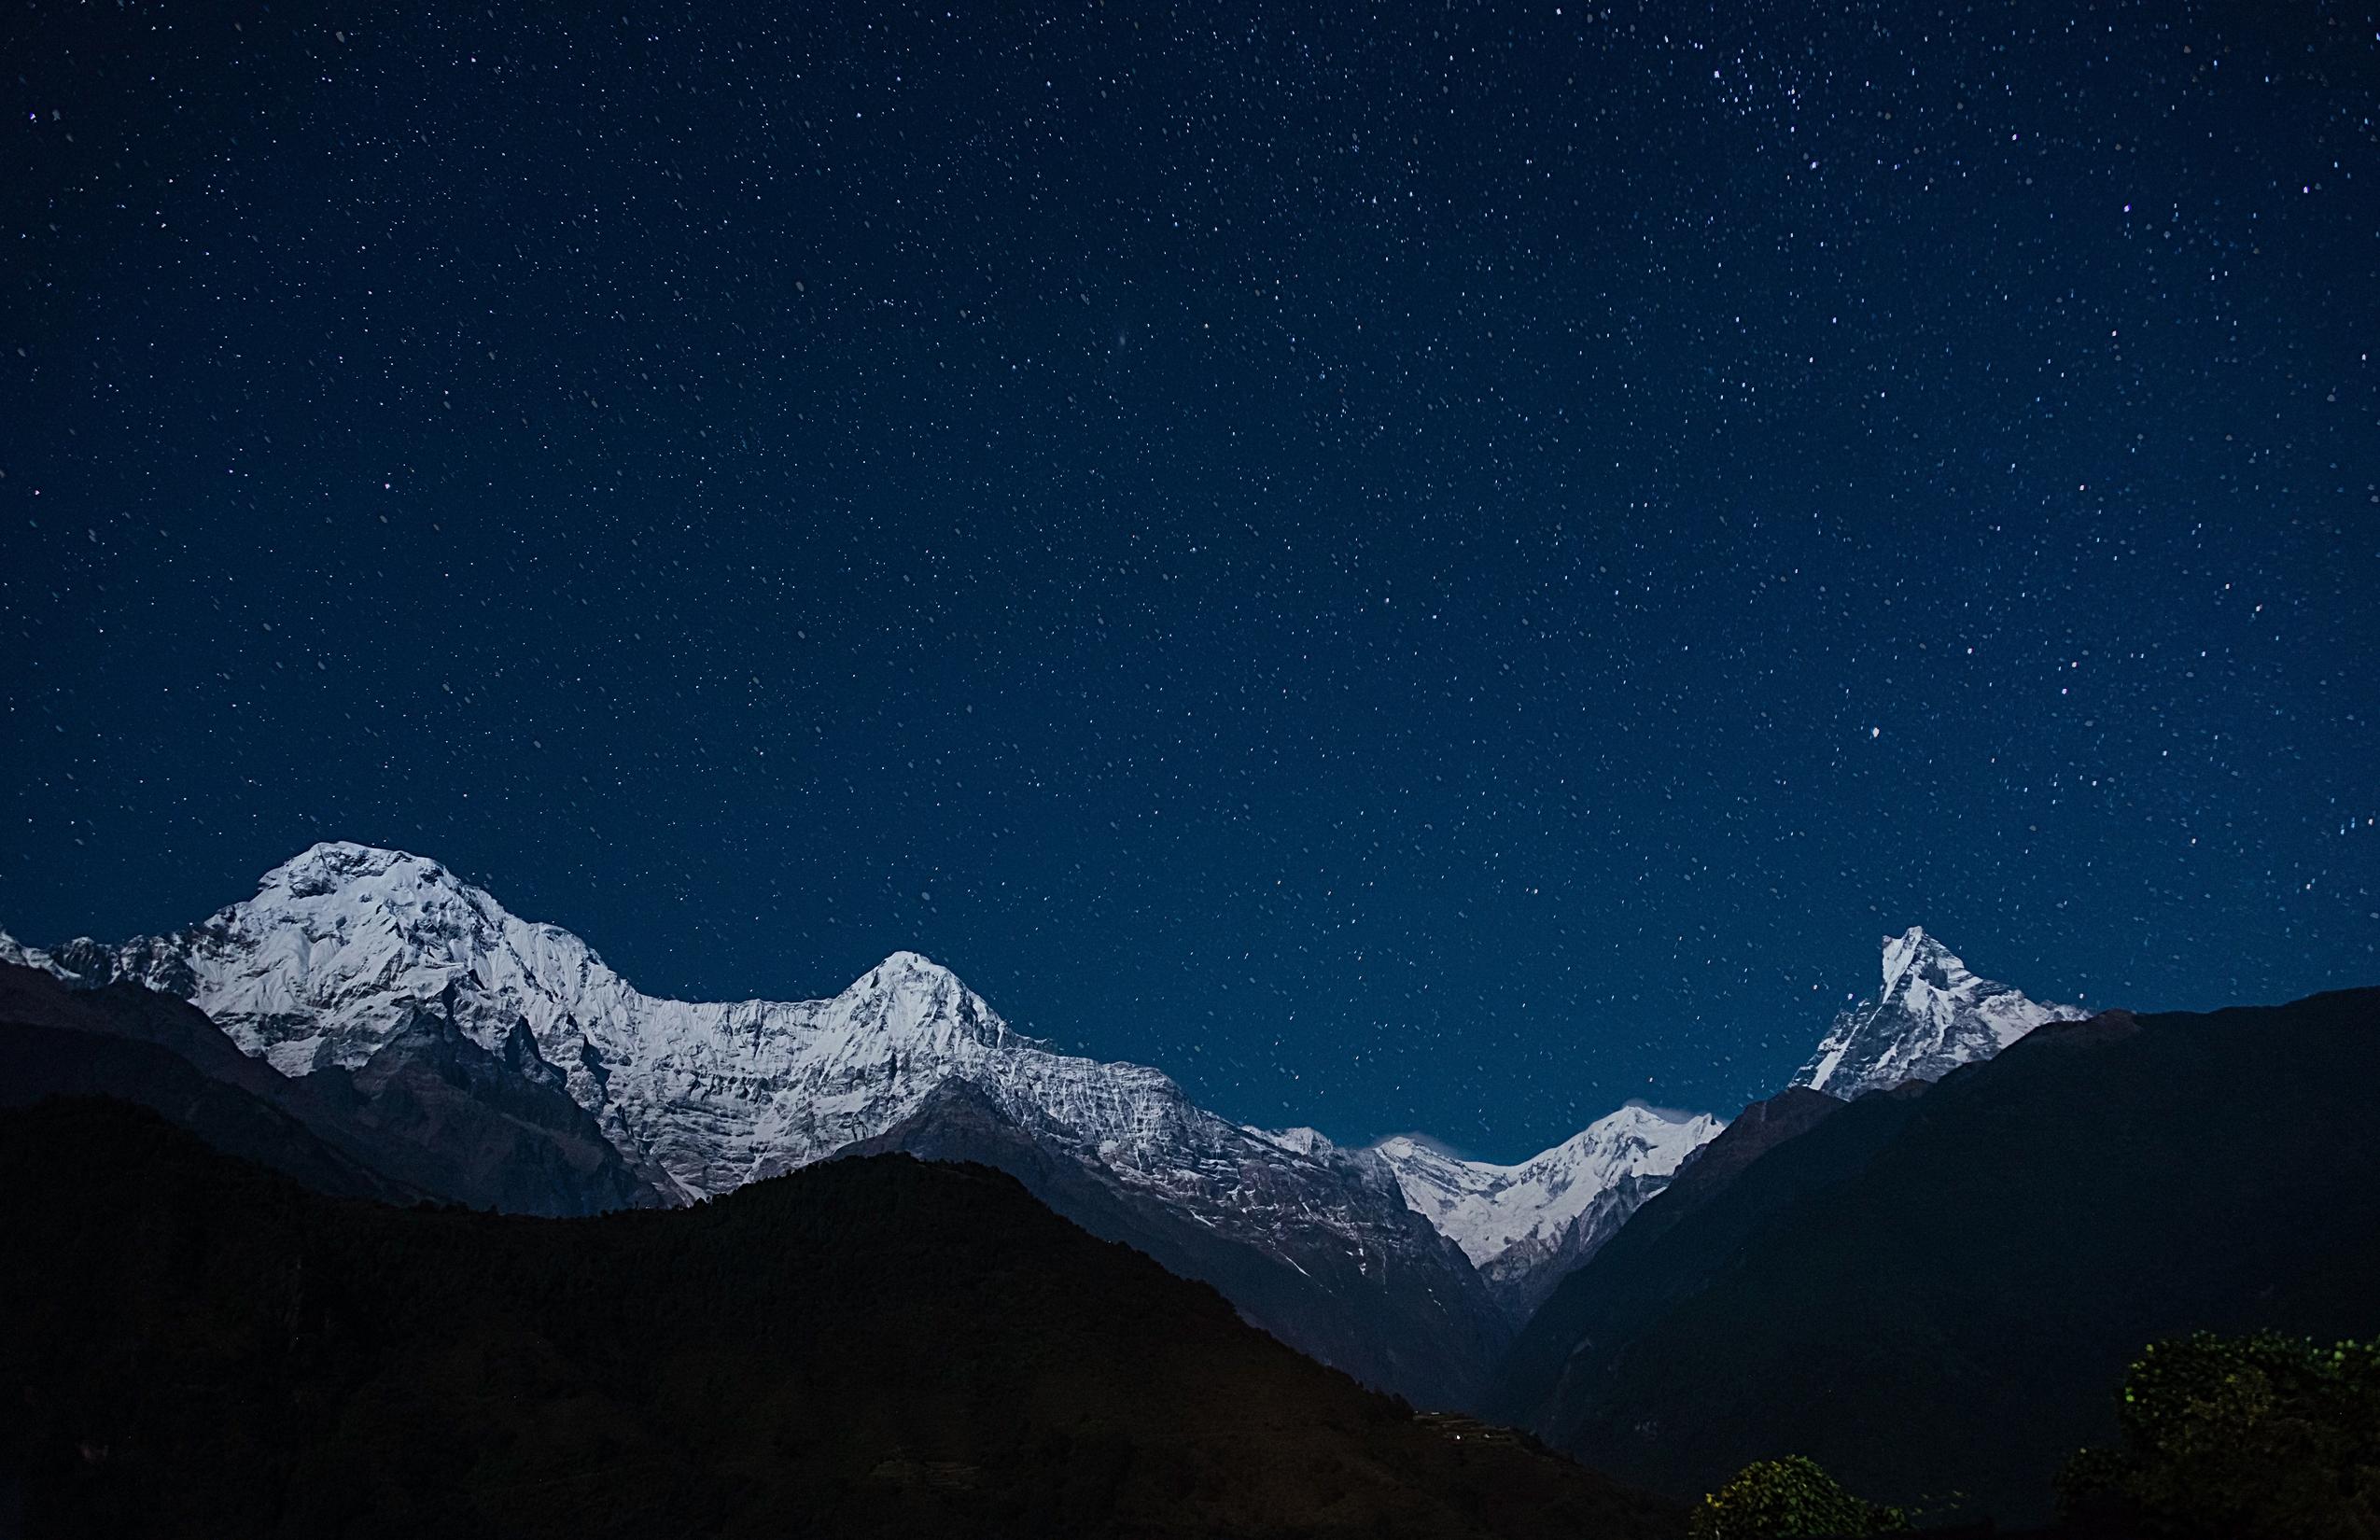 Sapheneia Starry Sky 17 x 11 mtns 4